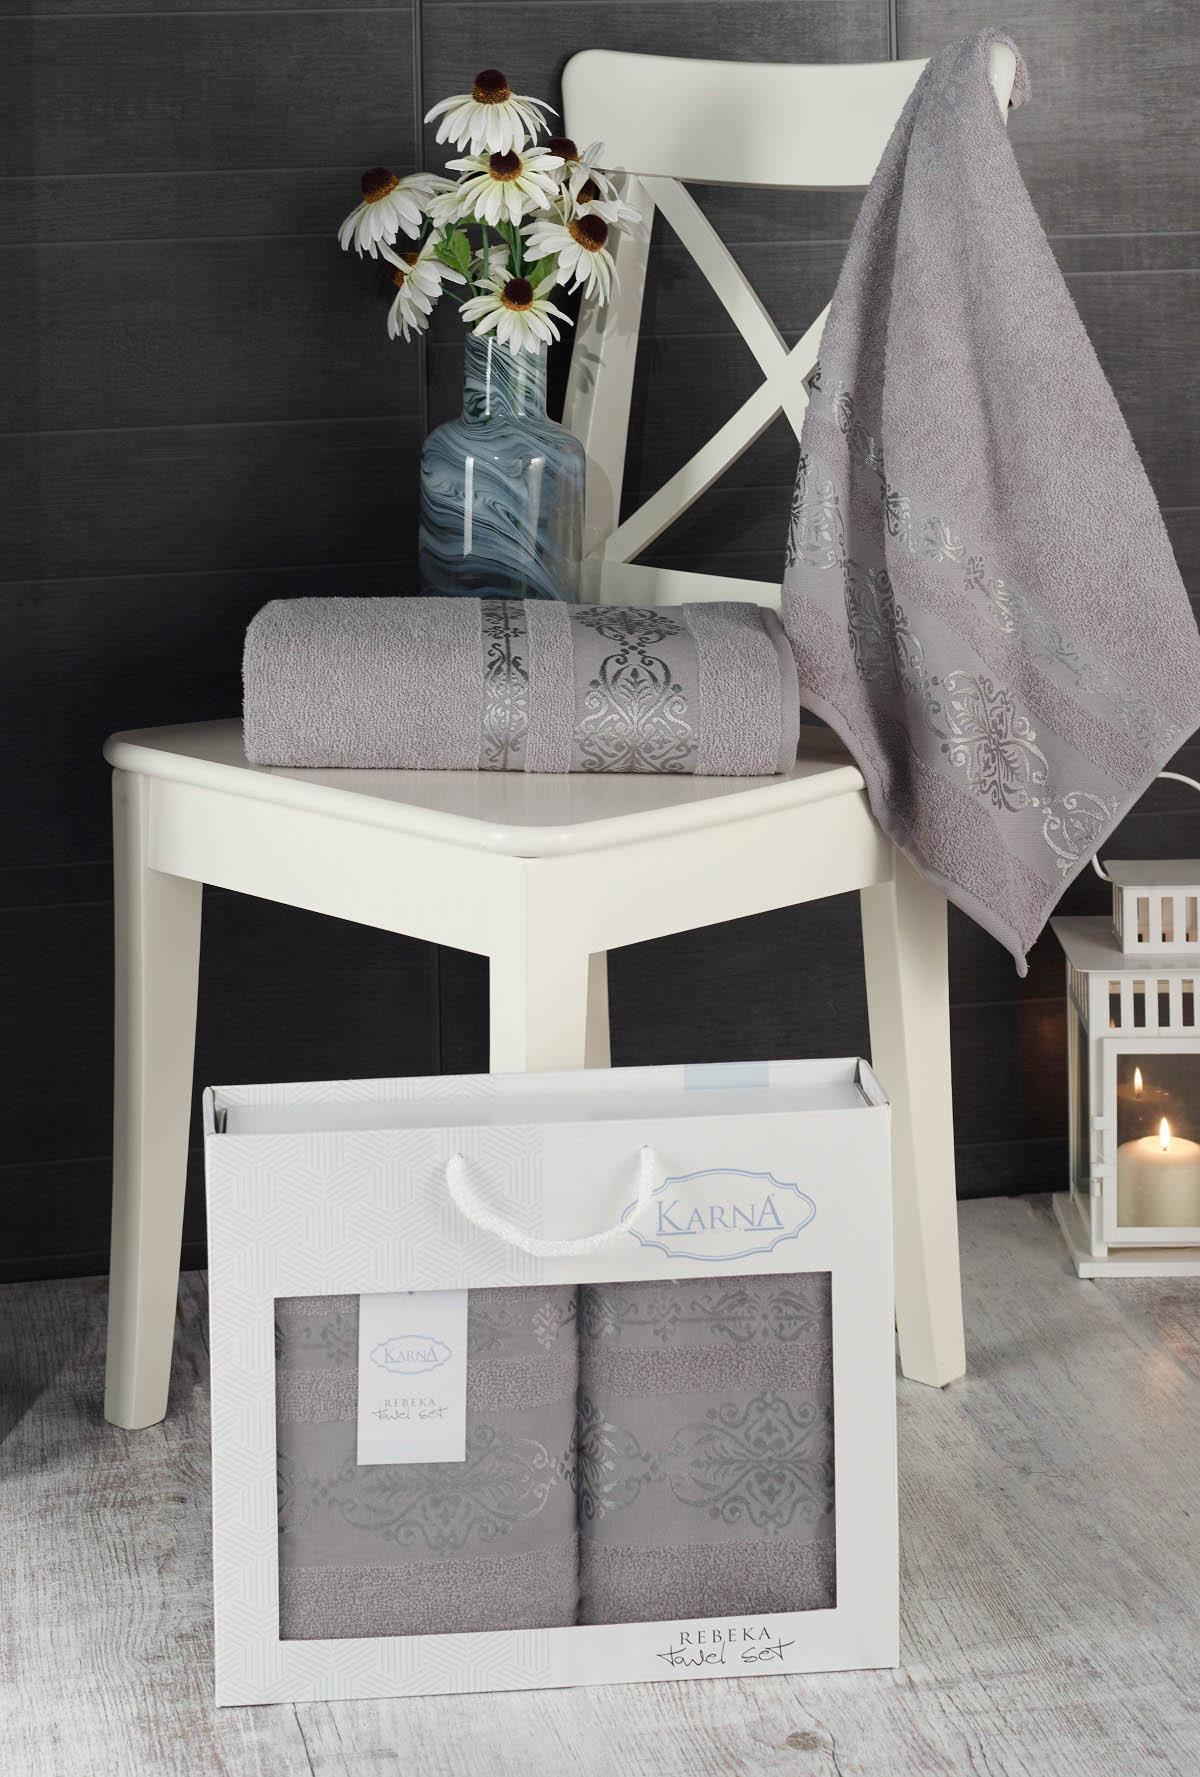 Полотенца Karna Полотенце Rebeca Цвет: Серый (50х90 см,70х140 см) цены онлайн